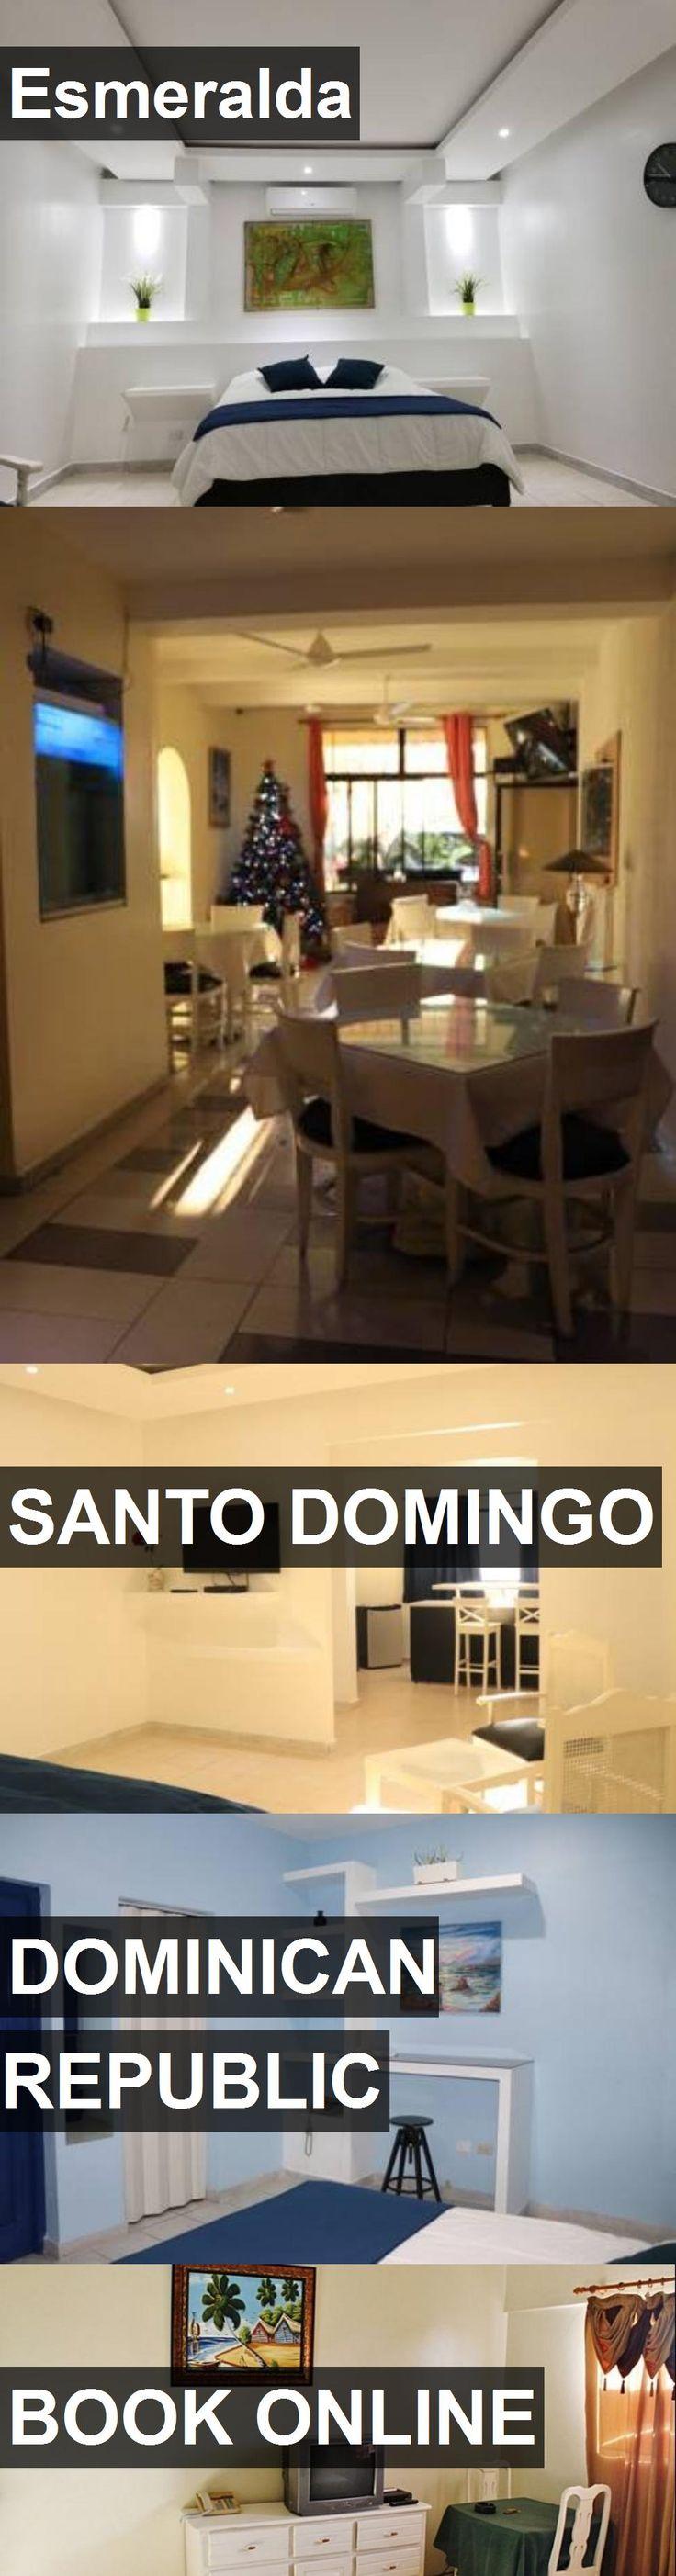 Hotel Esmeralda in Santo Domingo, Dominican Republic. For more information, photos, reviews and best prices please follow the link. #DominicanRepublic #SantoDomingo #travel #vacation #hotel